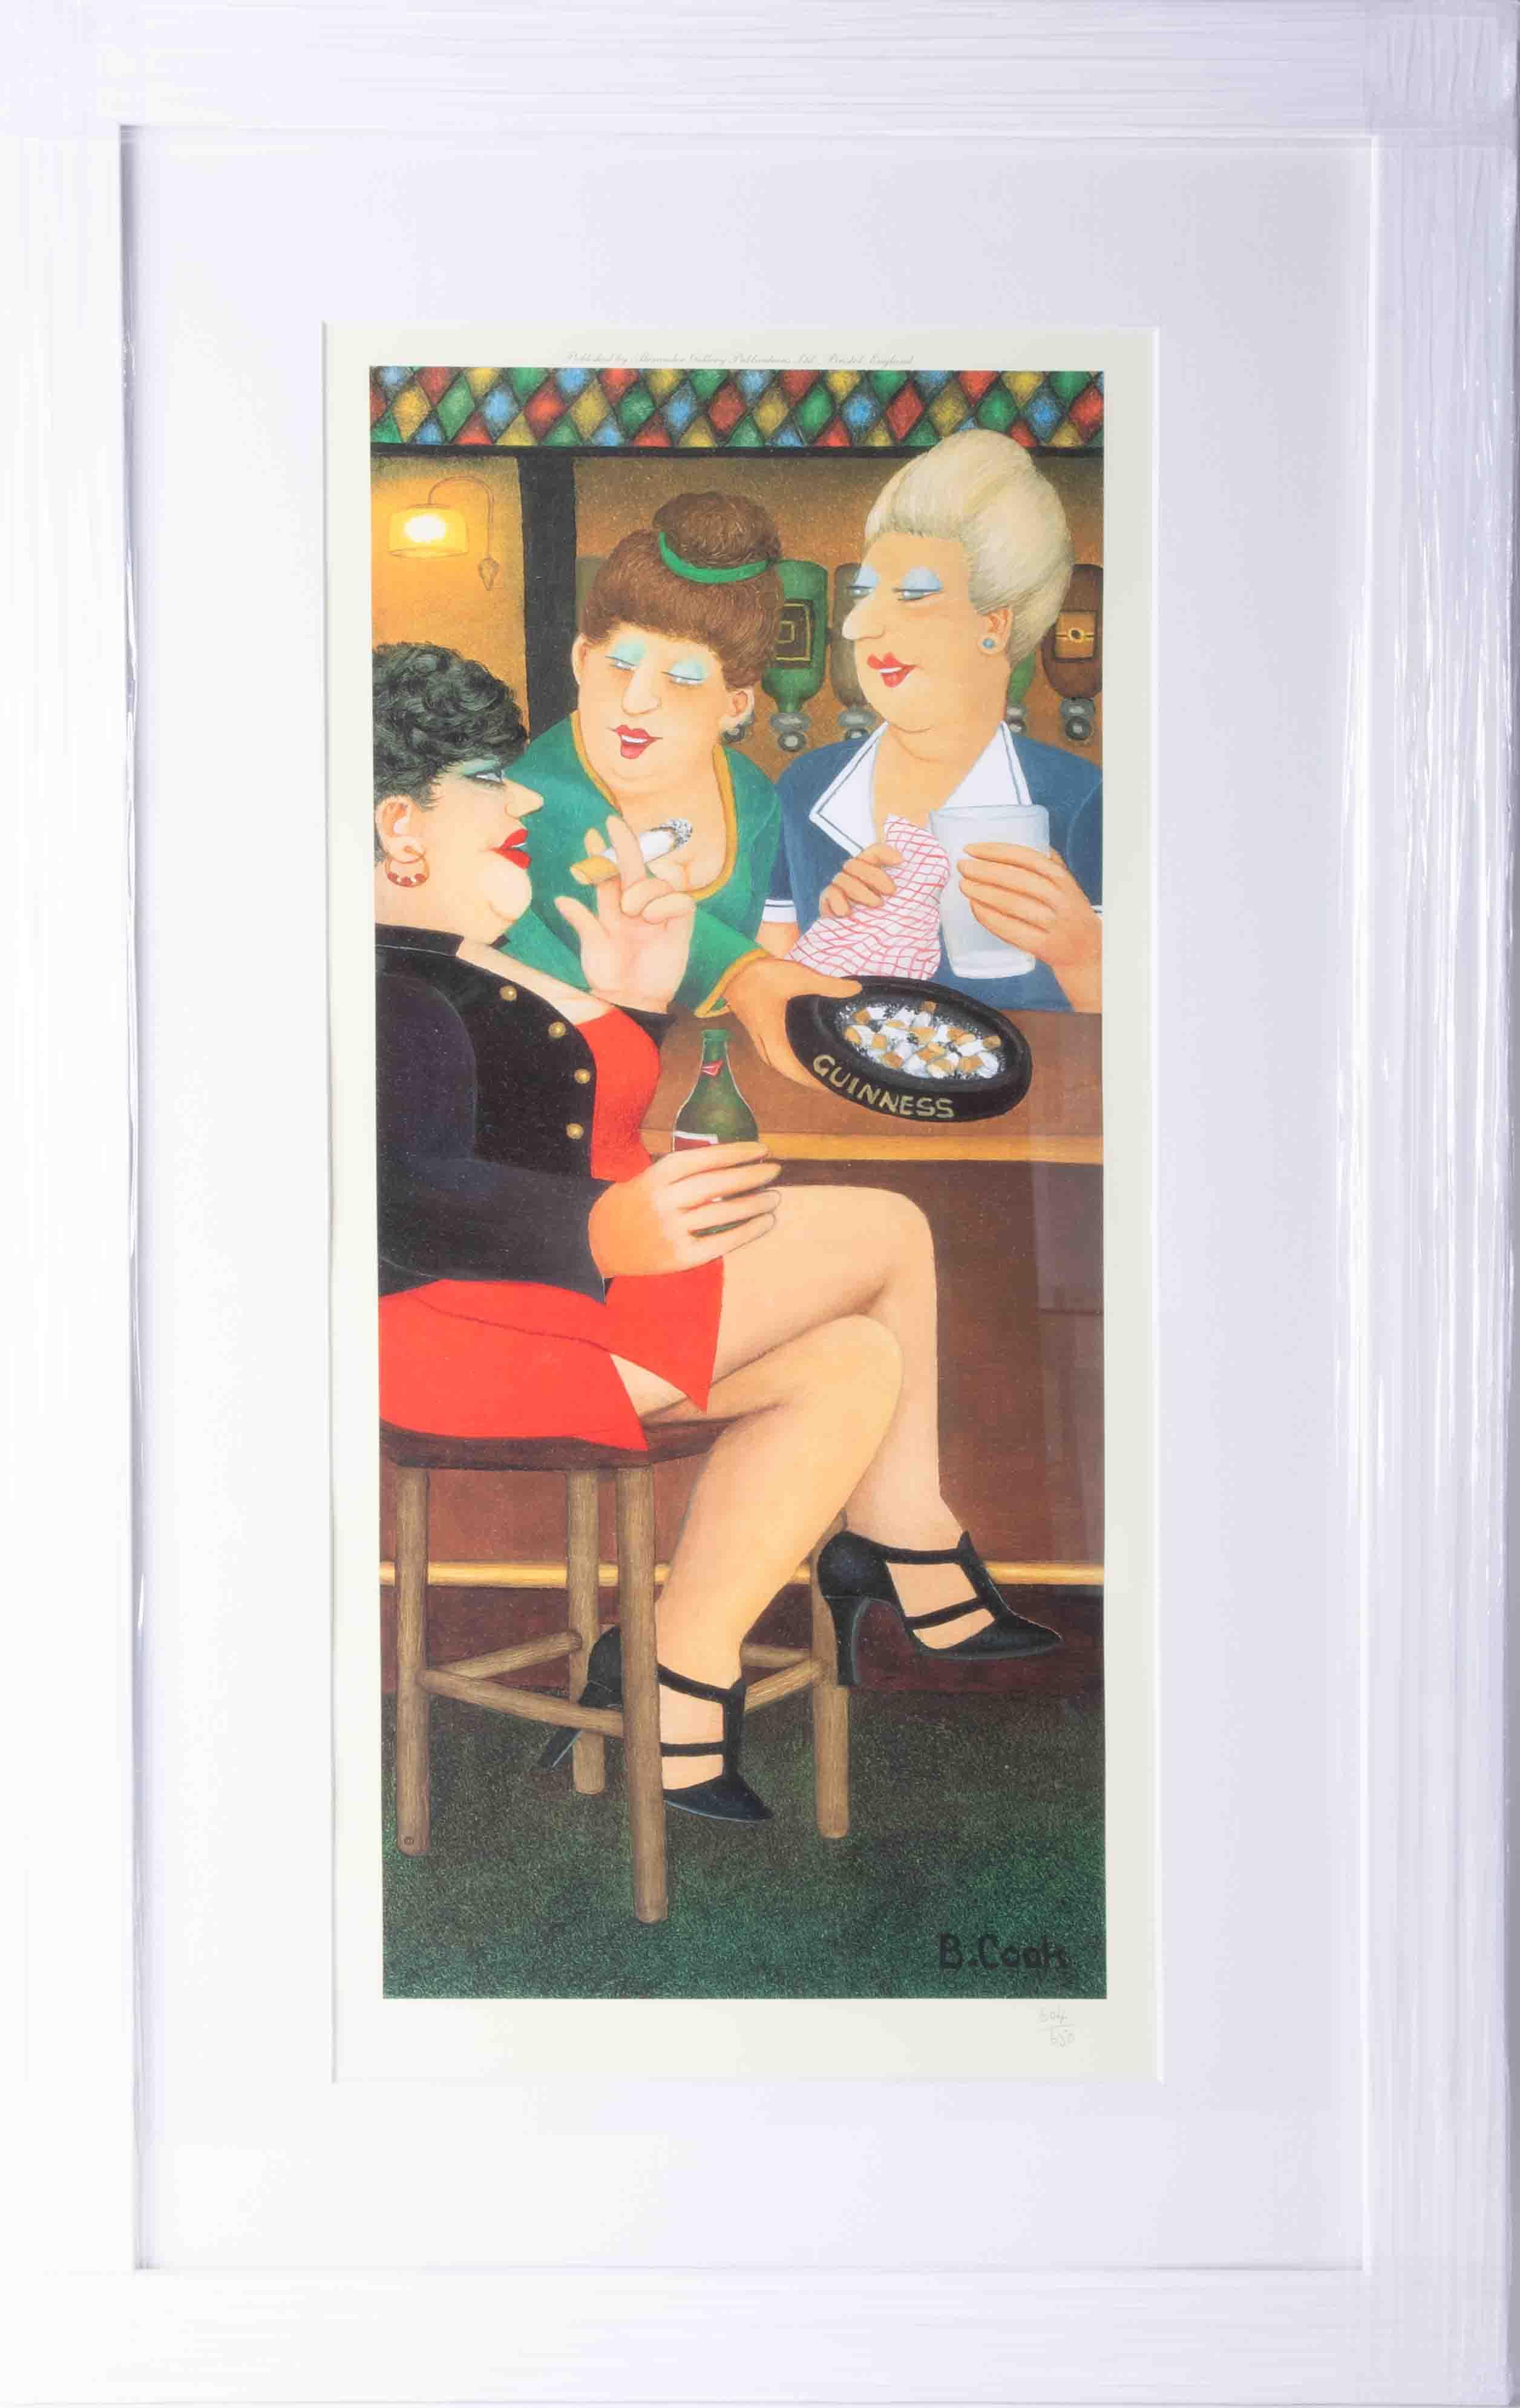 Beryl Cook (1926-2008) 'Last Gasp' limited edition print 604/650, 50cm x 21cm, framed and glazed,